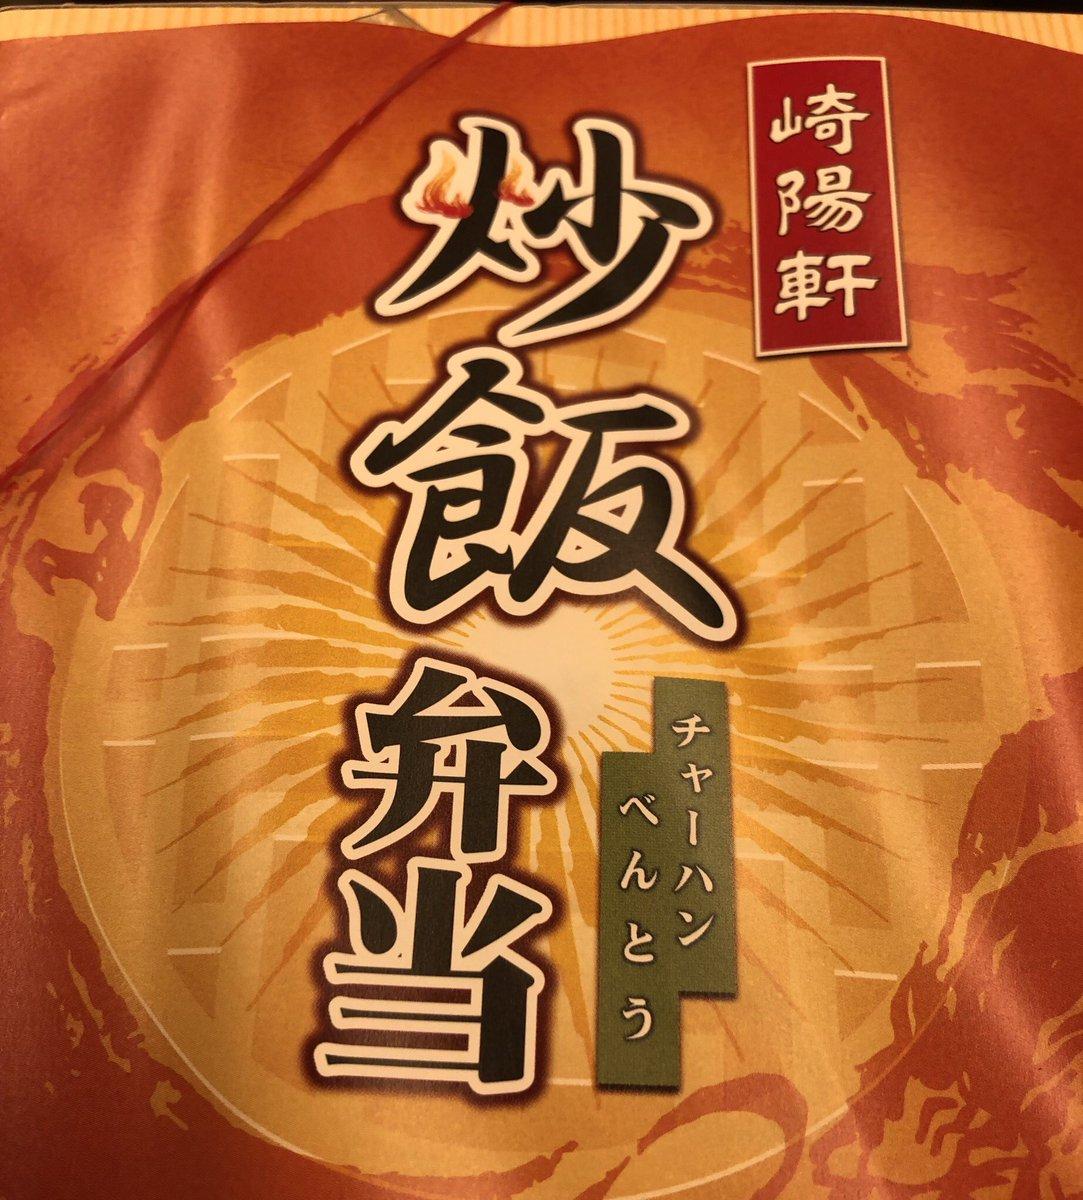 test ツイッターメディア - サマボム出演から新幹線乗車で仙台帰省へ(東京駅で京葉線ホーム→新幹線ホームへのウォーキング含む)。今晩は帰省がてら仙台Hi-Hat「超黒」でファンク中心にスピンします。24時からの出番です♪ https://t.co/2yKYjEm3wd